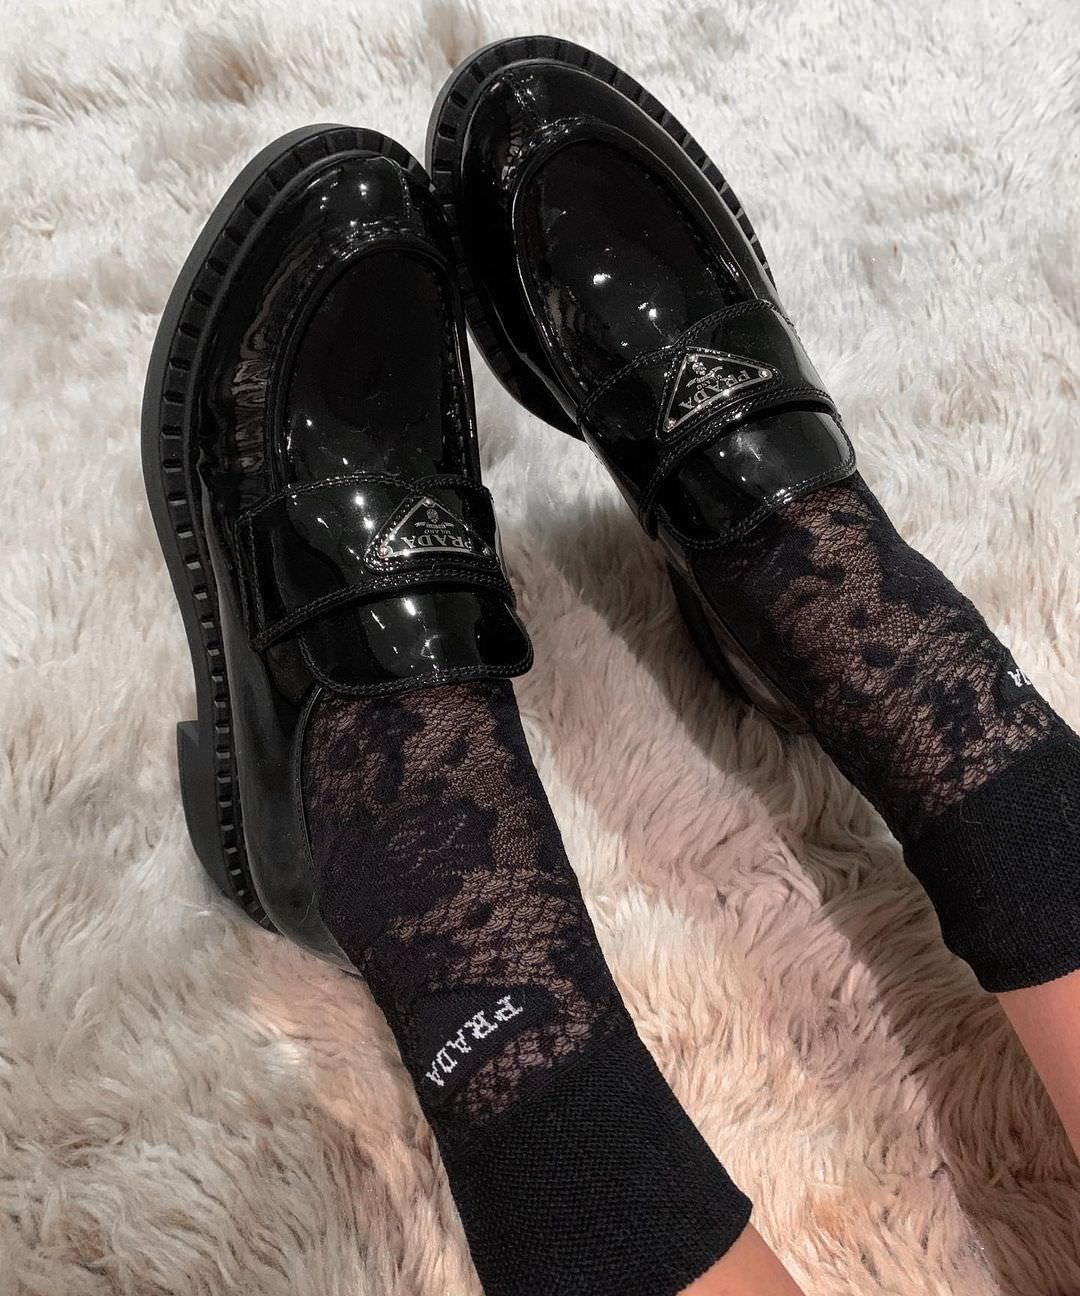 Prada-Leather-Loafers-2